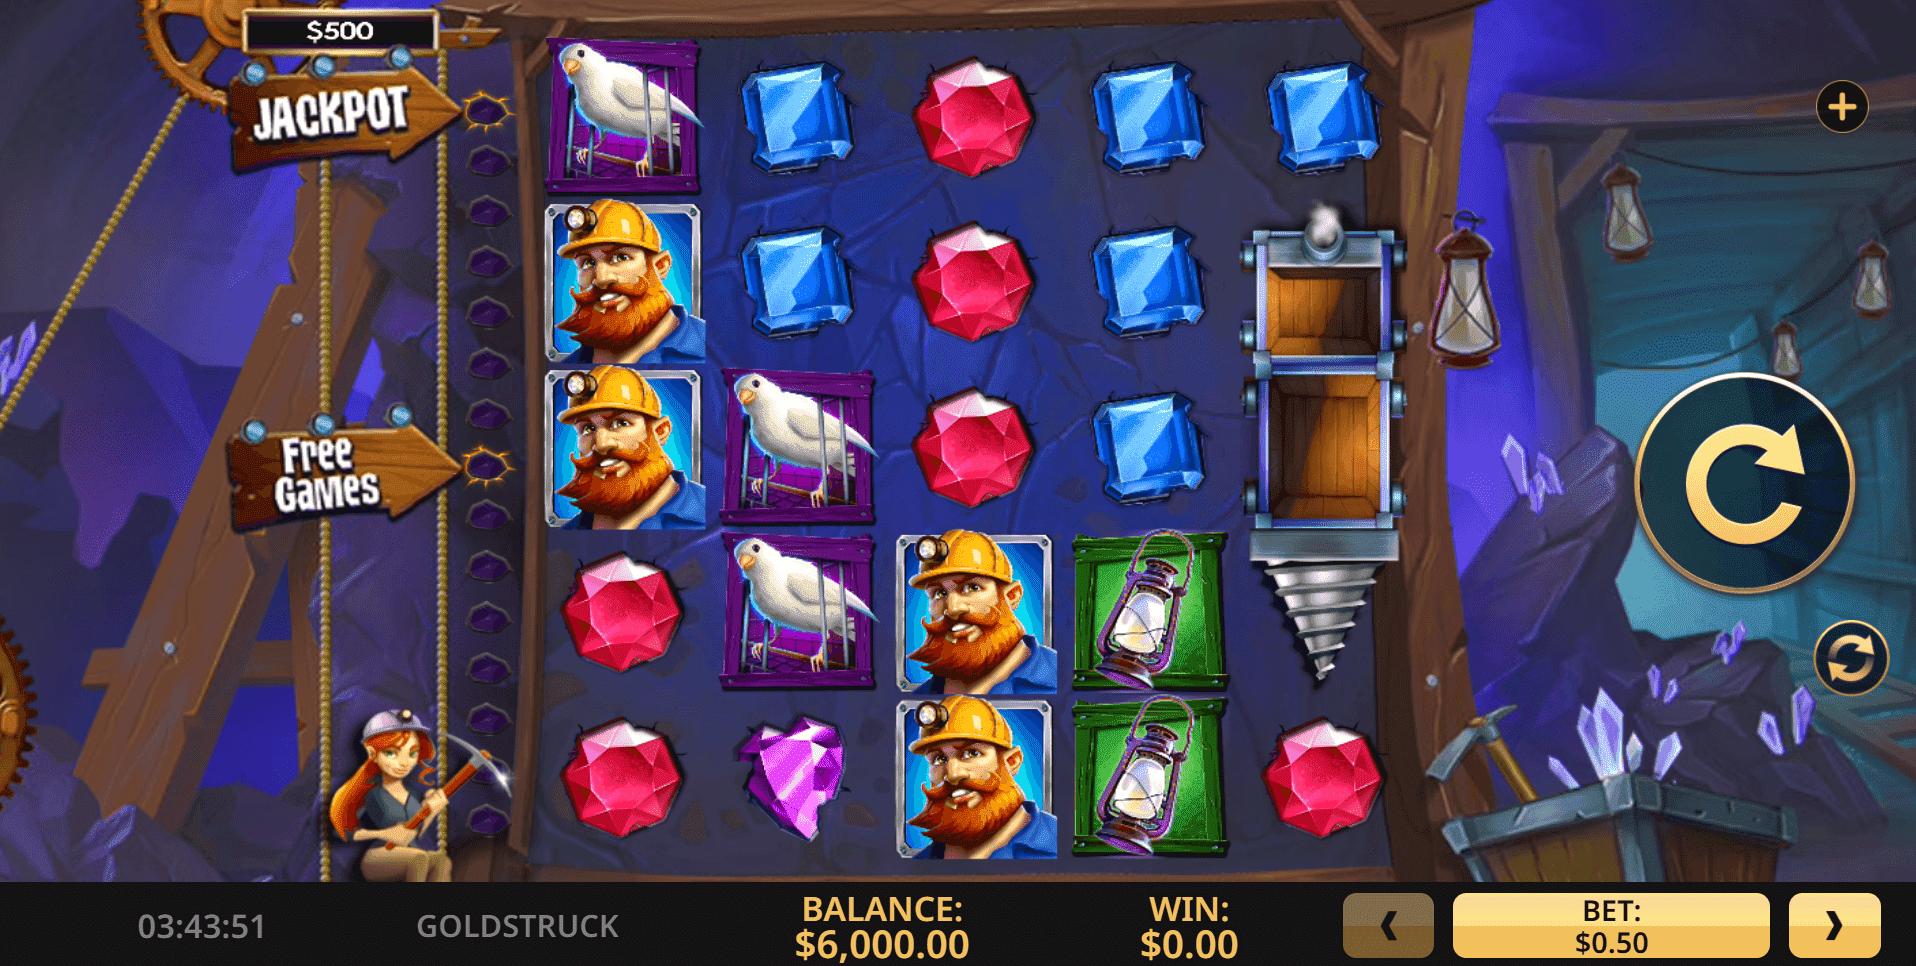 Goldstruck slot machine screenshot